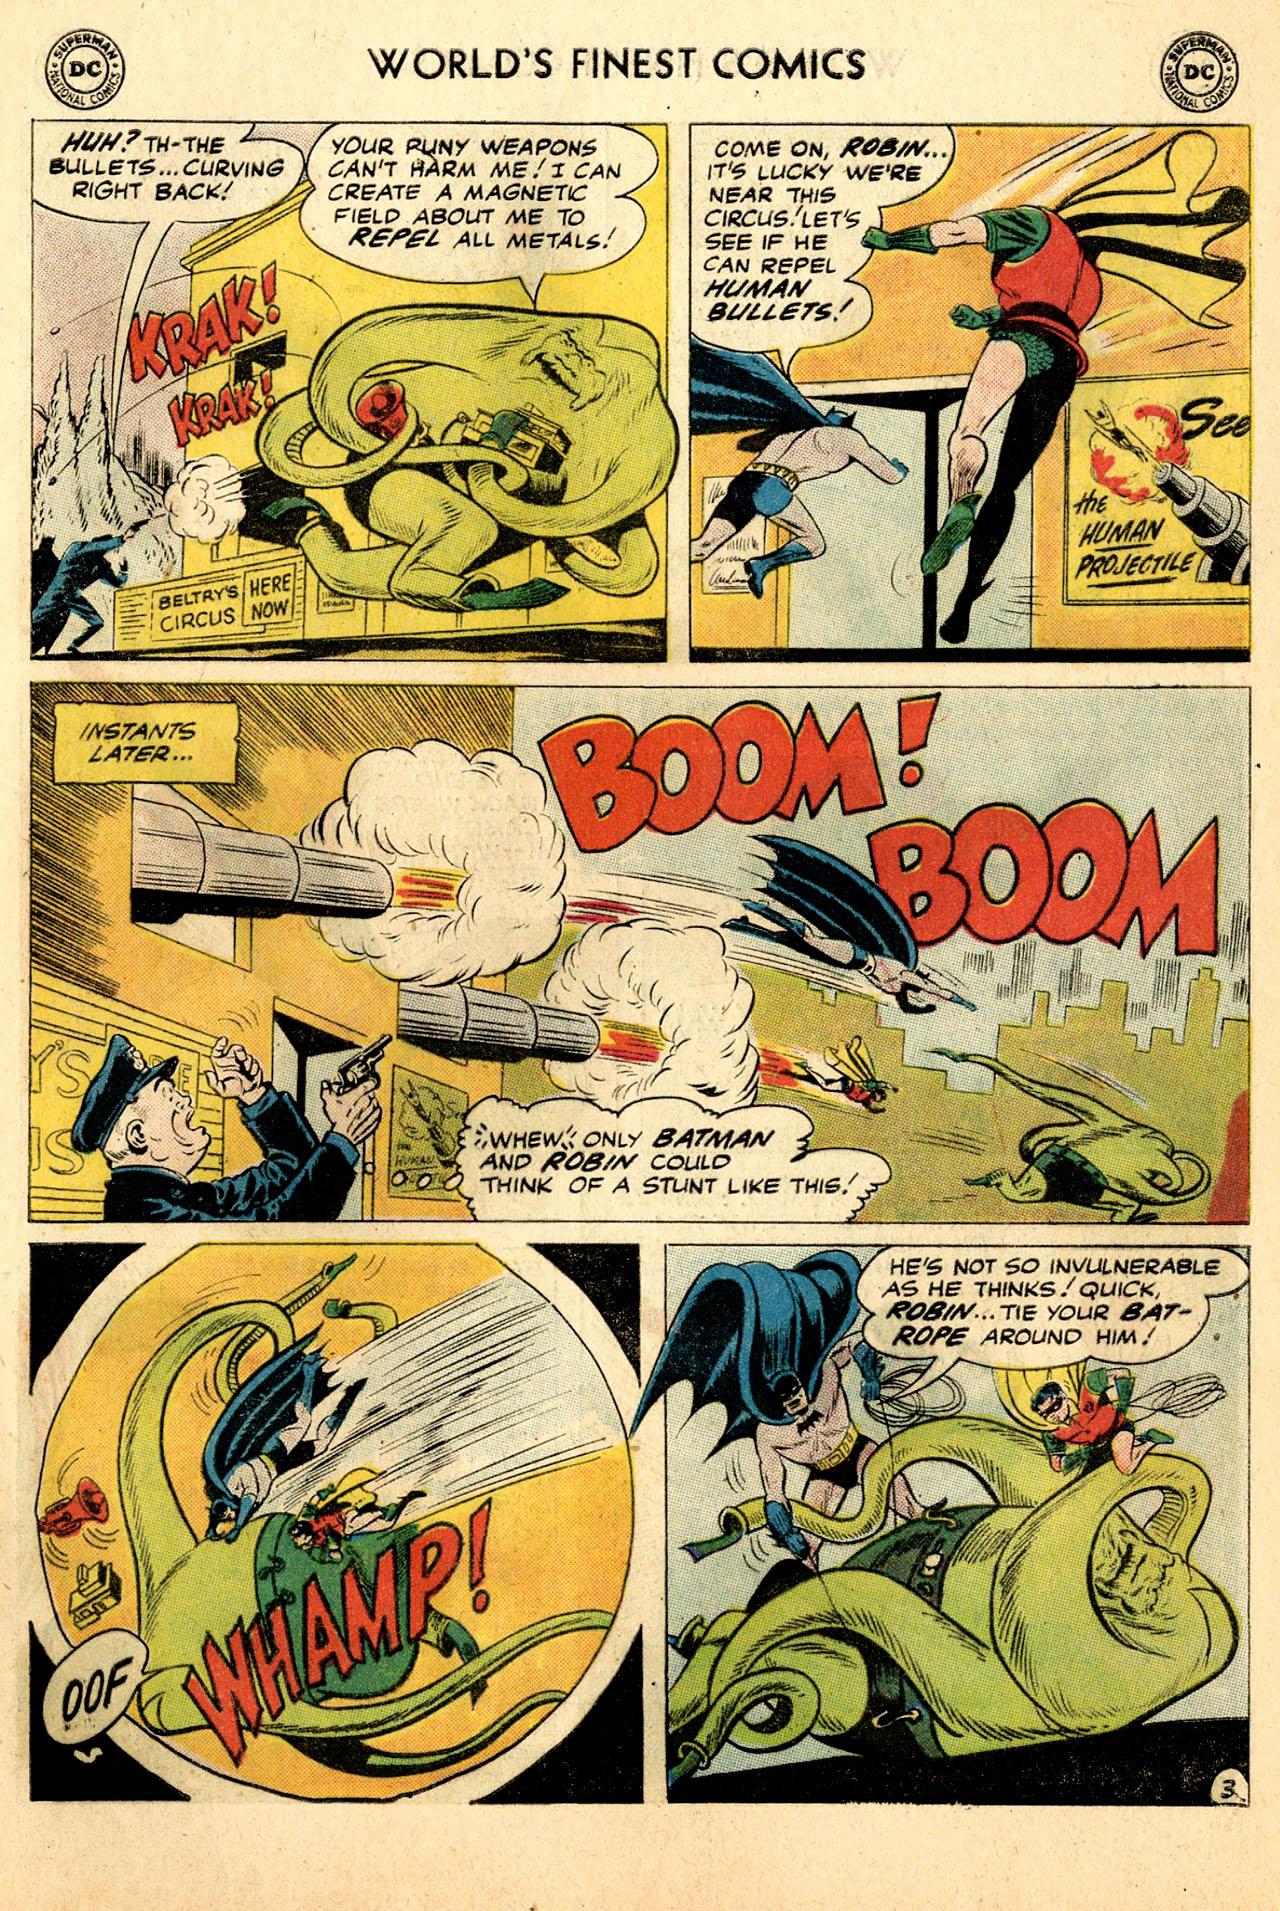 Read online World's Finest Comics comic -  Issue #110 - 5